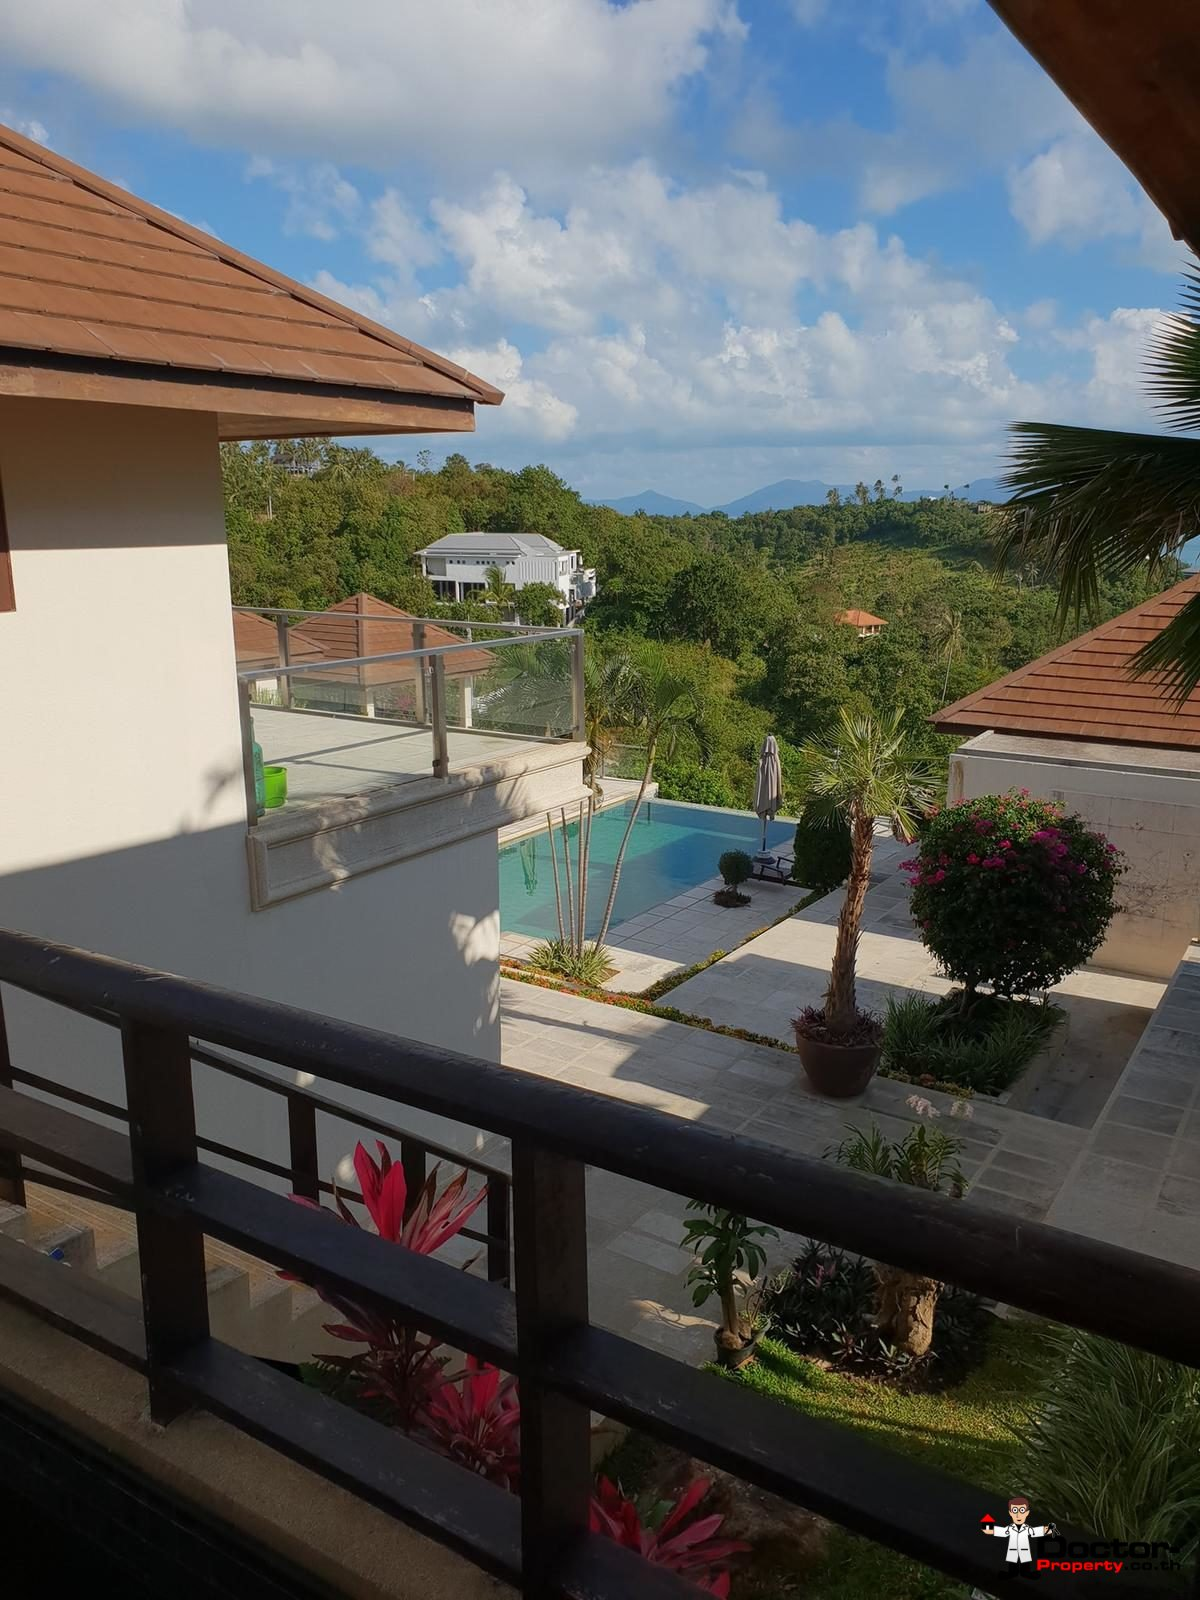 6 Bedroom Villa with Sea View - Bophut - Koh Samui - for sale 9